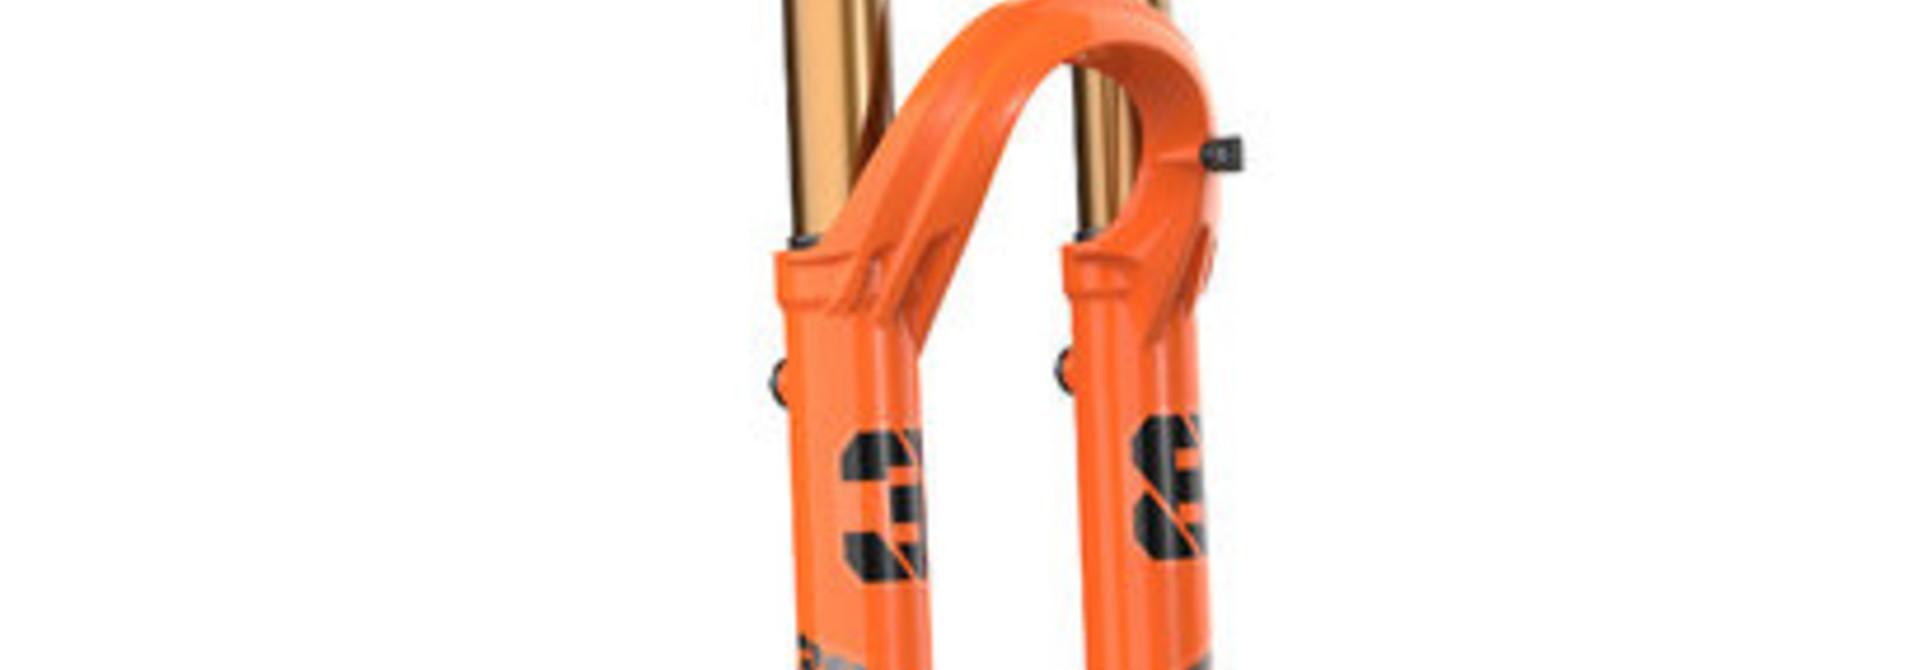 2021 Fox Float Factory 38,27.5in,180mm,Grip2, Shiny Orange,15QRx110, 44mm Rake